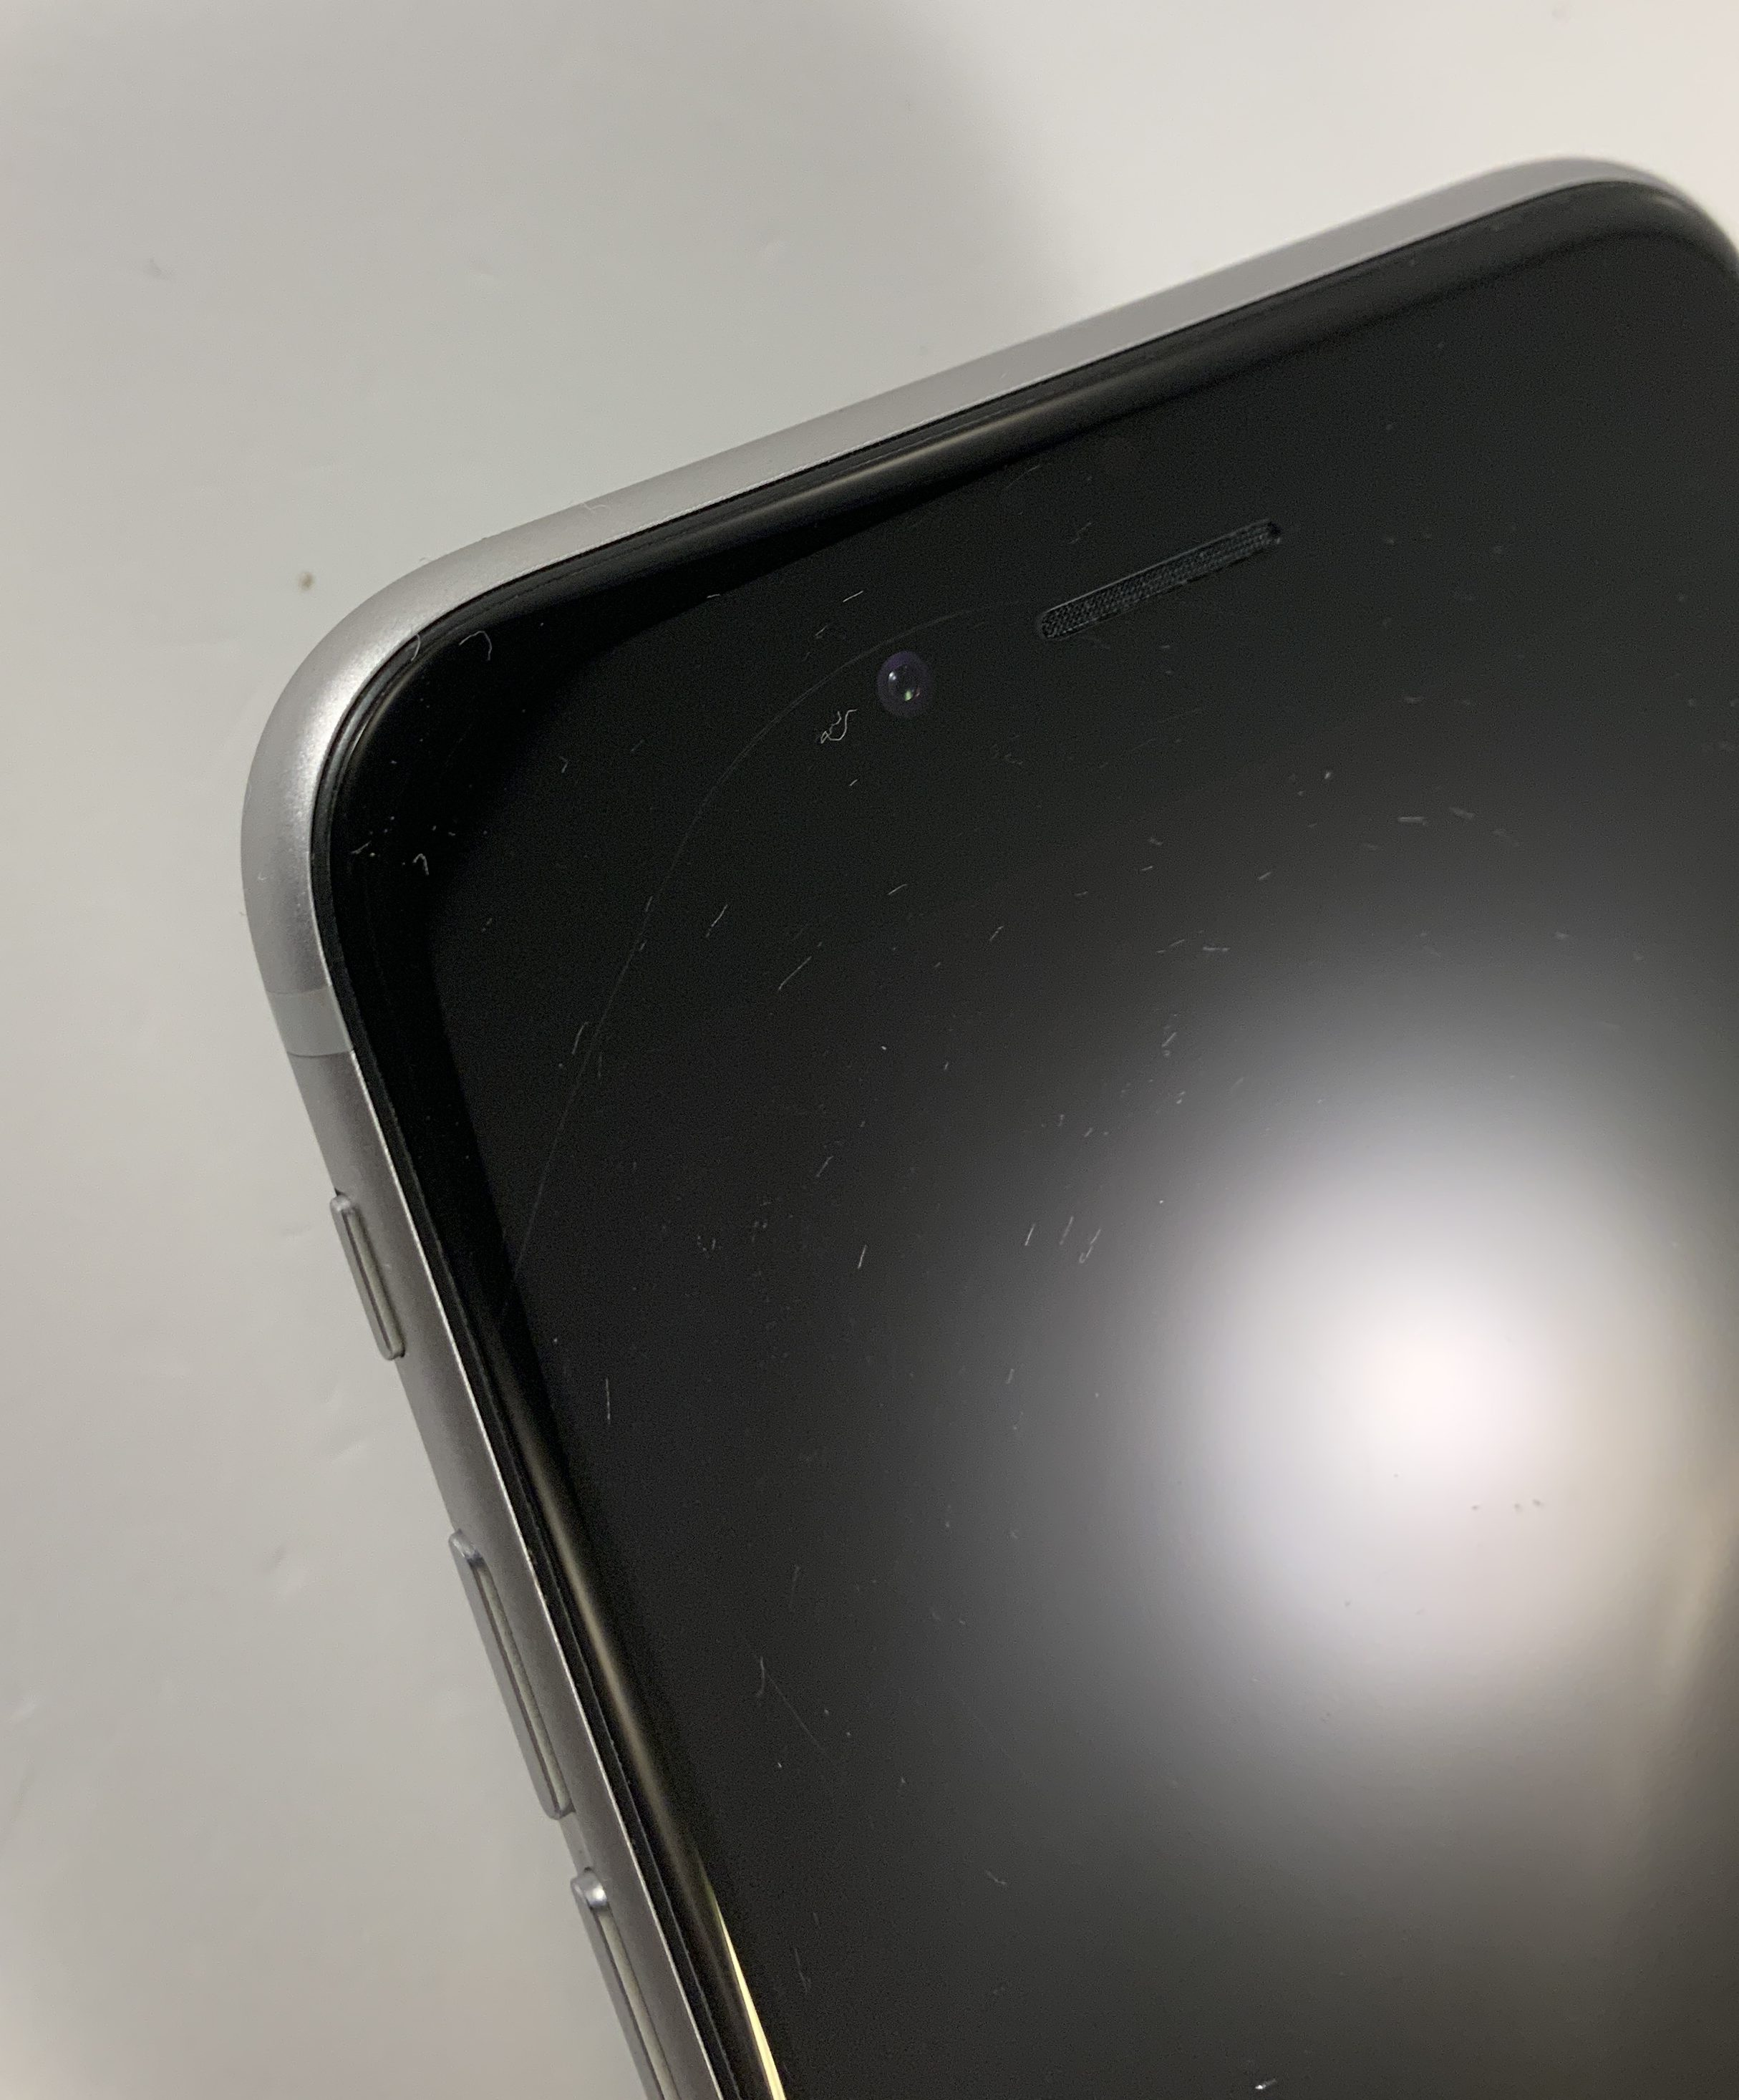 iPhone 6S 64GB, 64GB, Space Gray, immagine 3